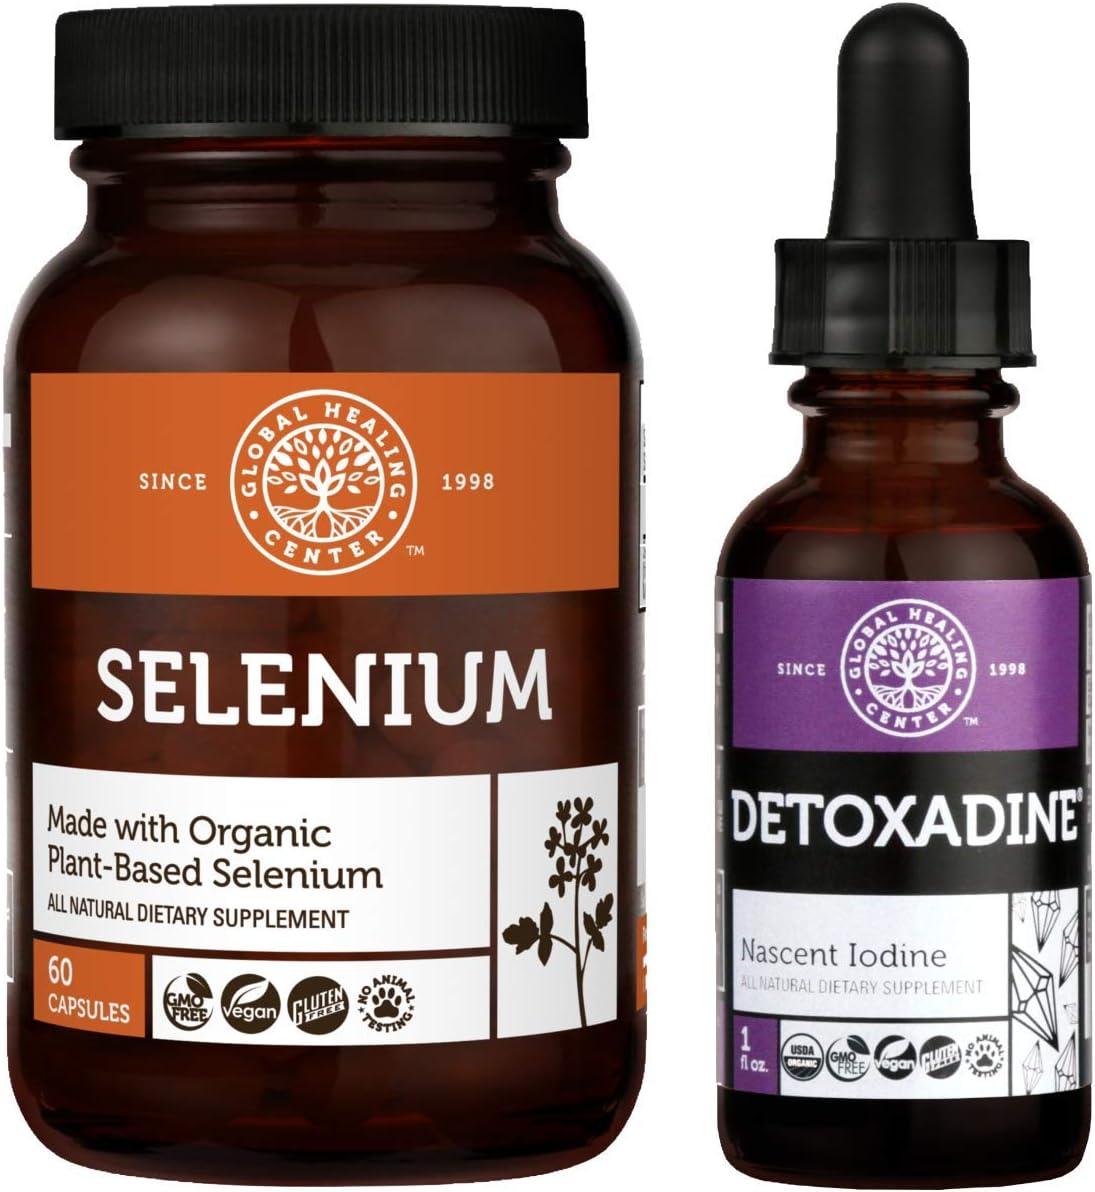 Global Healing Detoxadine and Selenium Kit - Organic Nascent Liquid Iodine Supplement Drops & Vegan Antioxidant for Thyroid Support & Normal Immune System Health - Women & Men - 1 Fl Oz & 60 Capsules